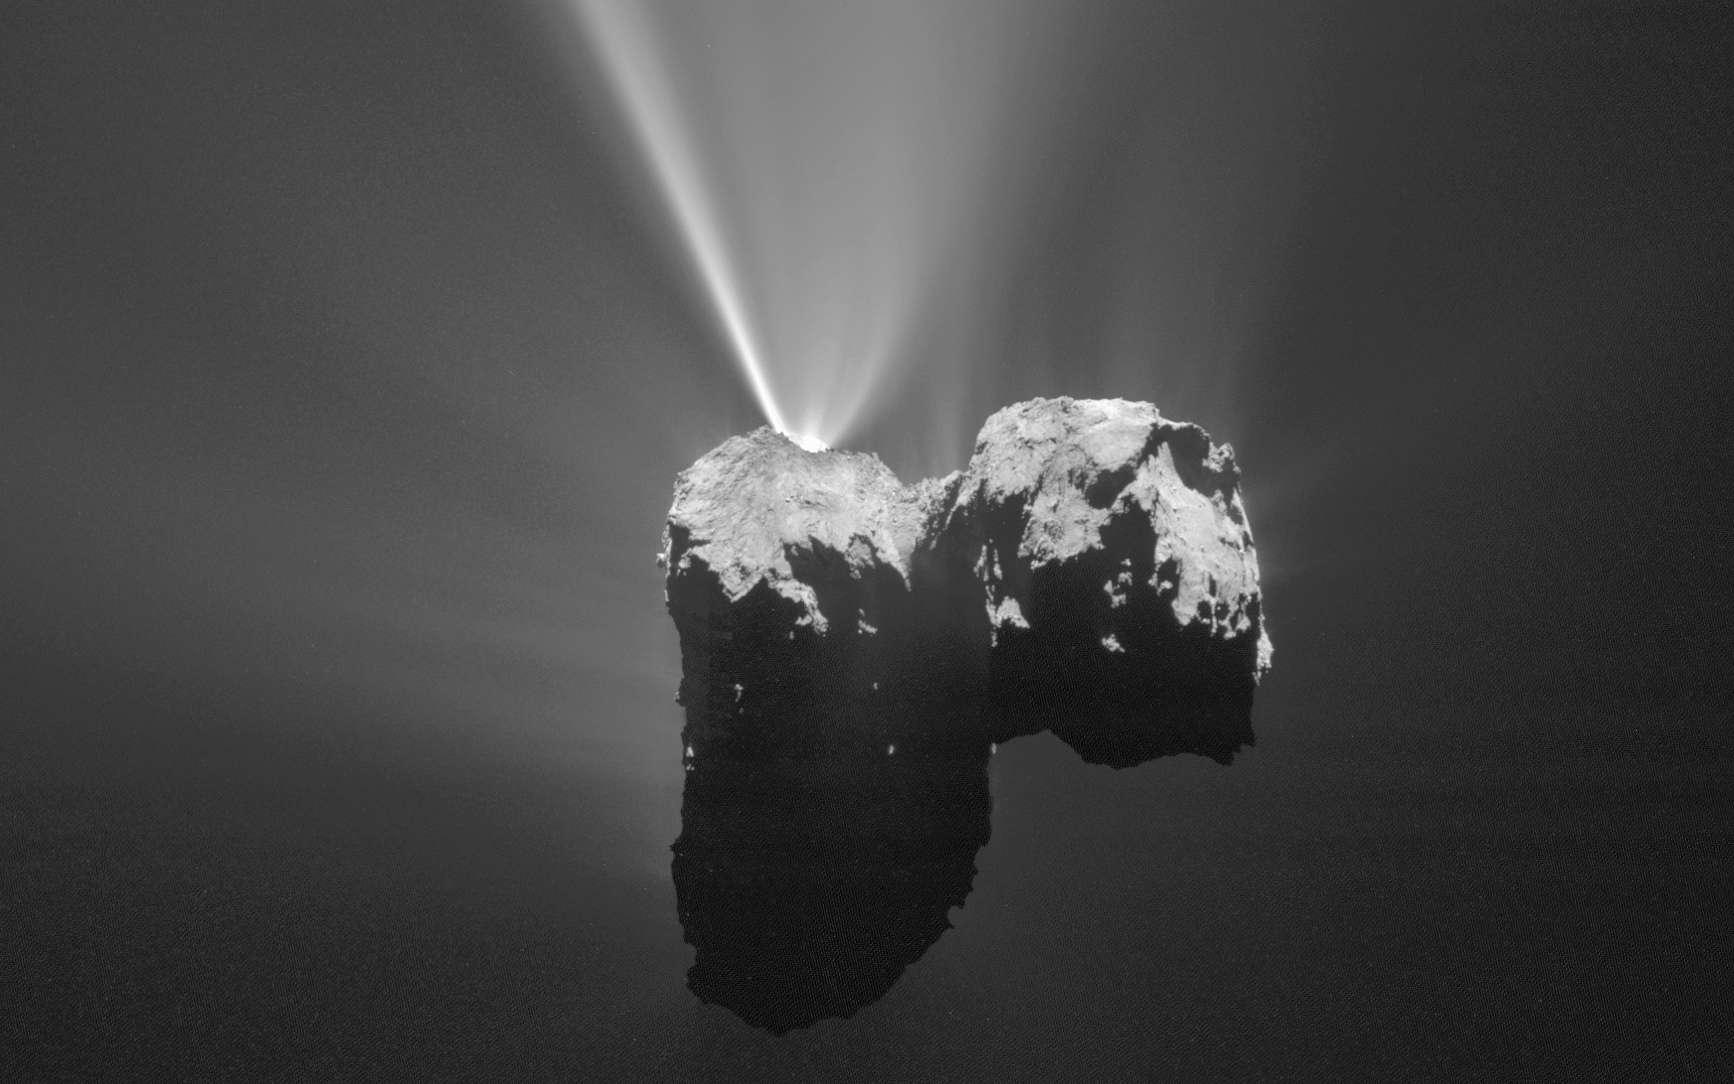 La comète Tchouri en pleine effervescence. Photo prise par la sonde Rosetta le 12 août 2015 au moment du périhélie. © ESA, Rosetta, MPS for OSIRIS Team MPS, UPD, LAM, IAA, SSO, INTA, UPM, DASP, IDA